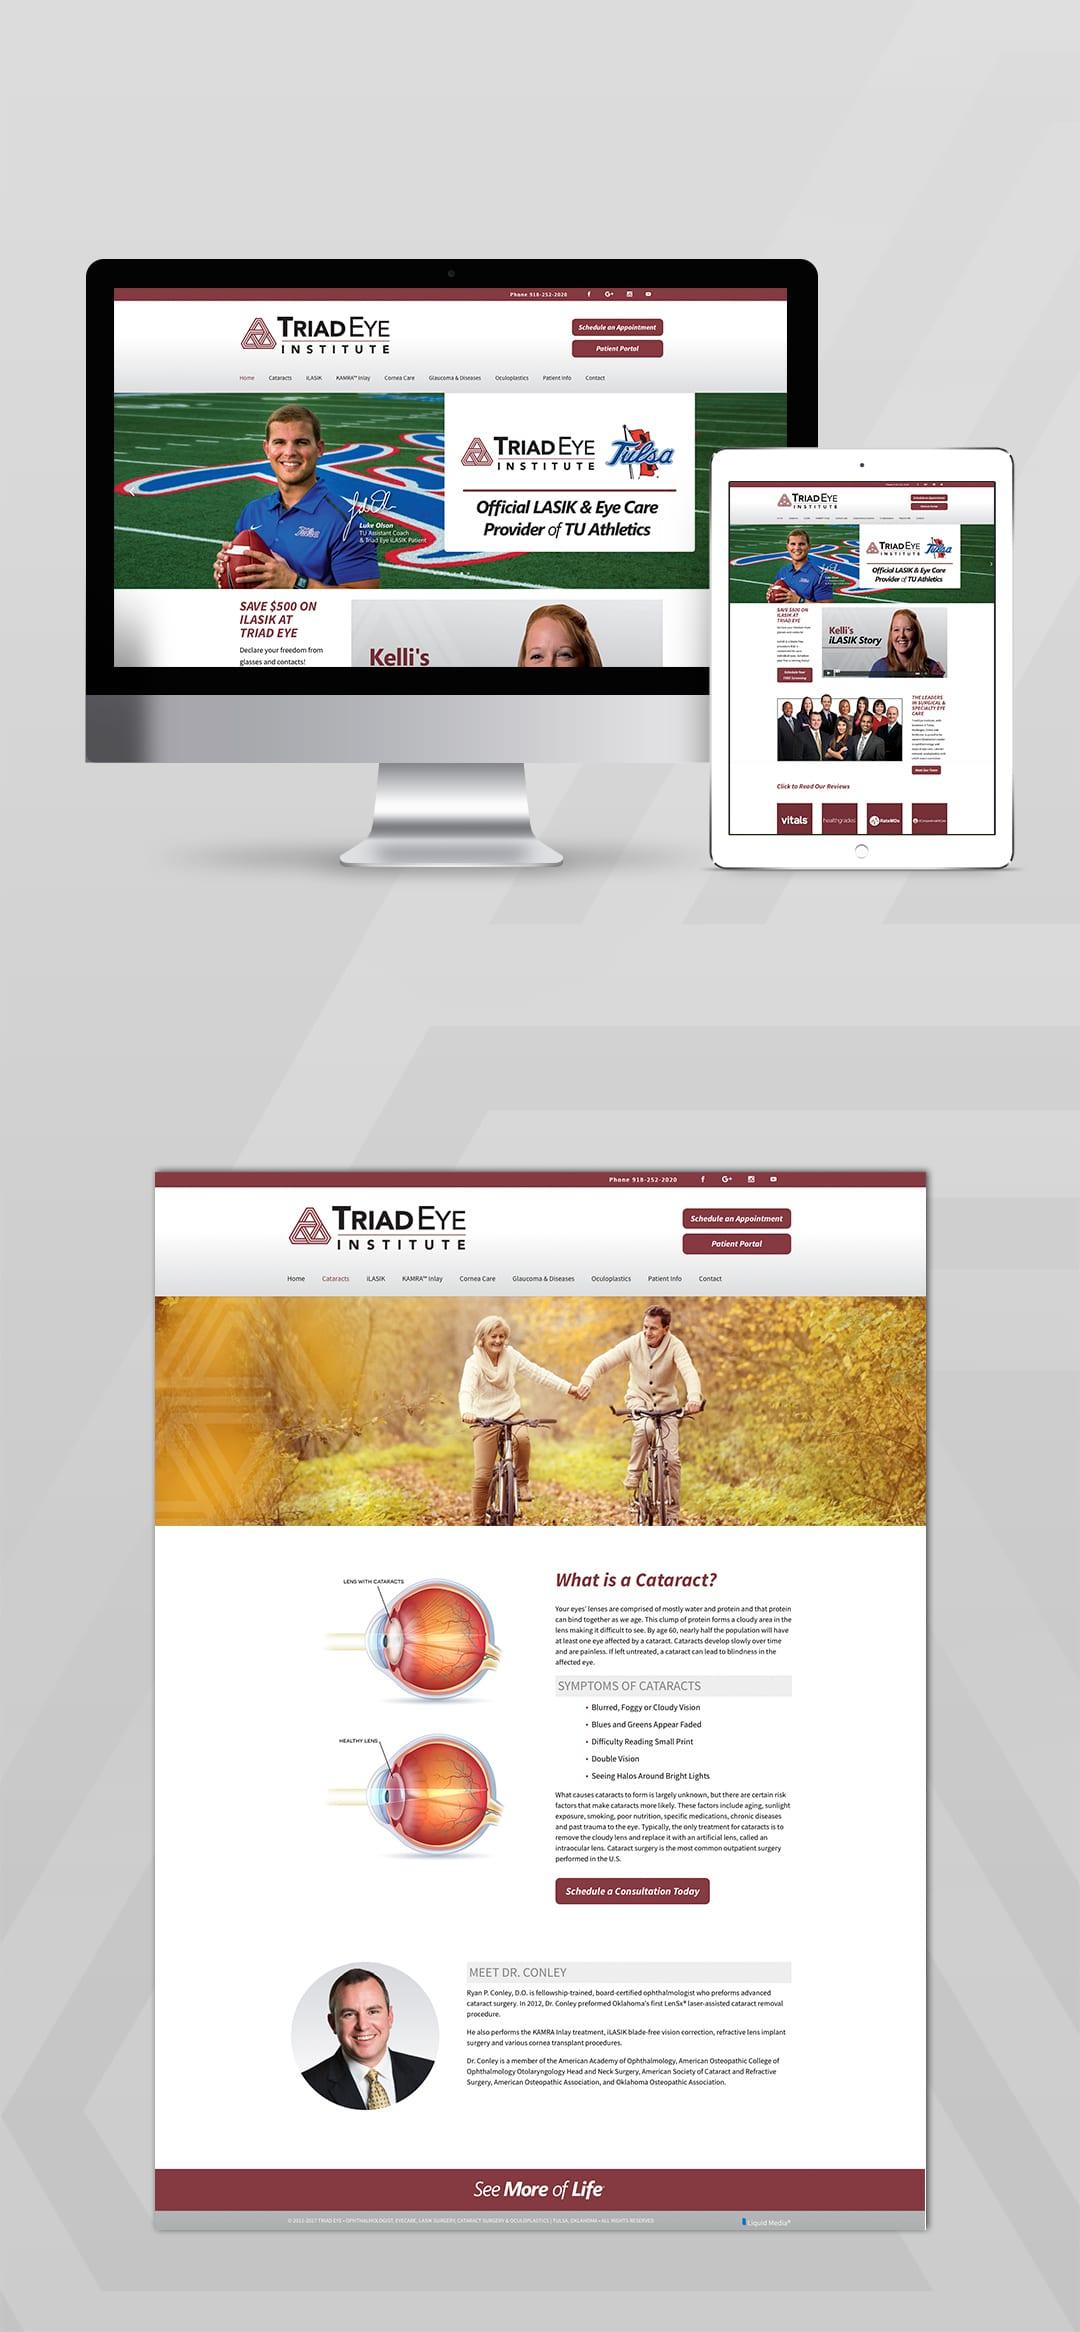 Triad Eye Institute Website Design by Liquid Media